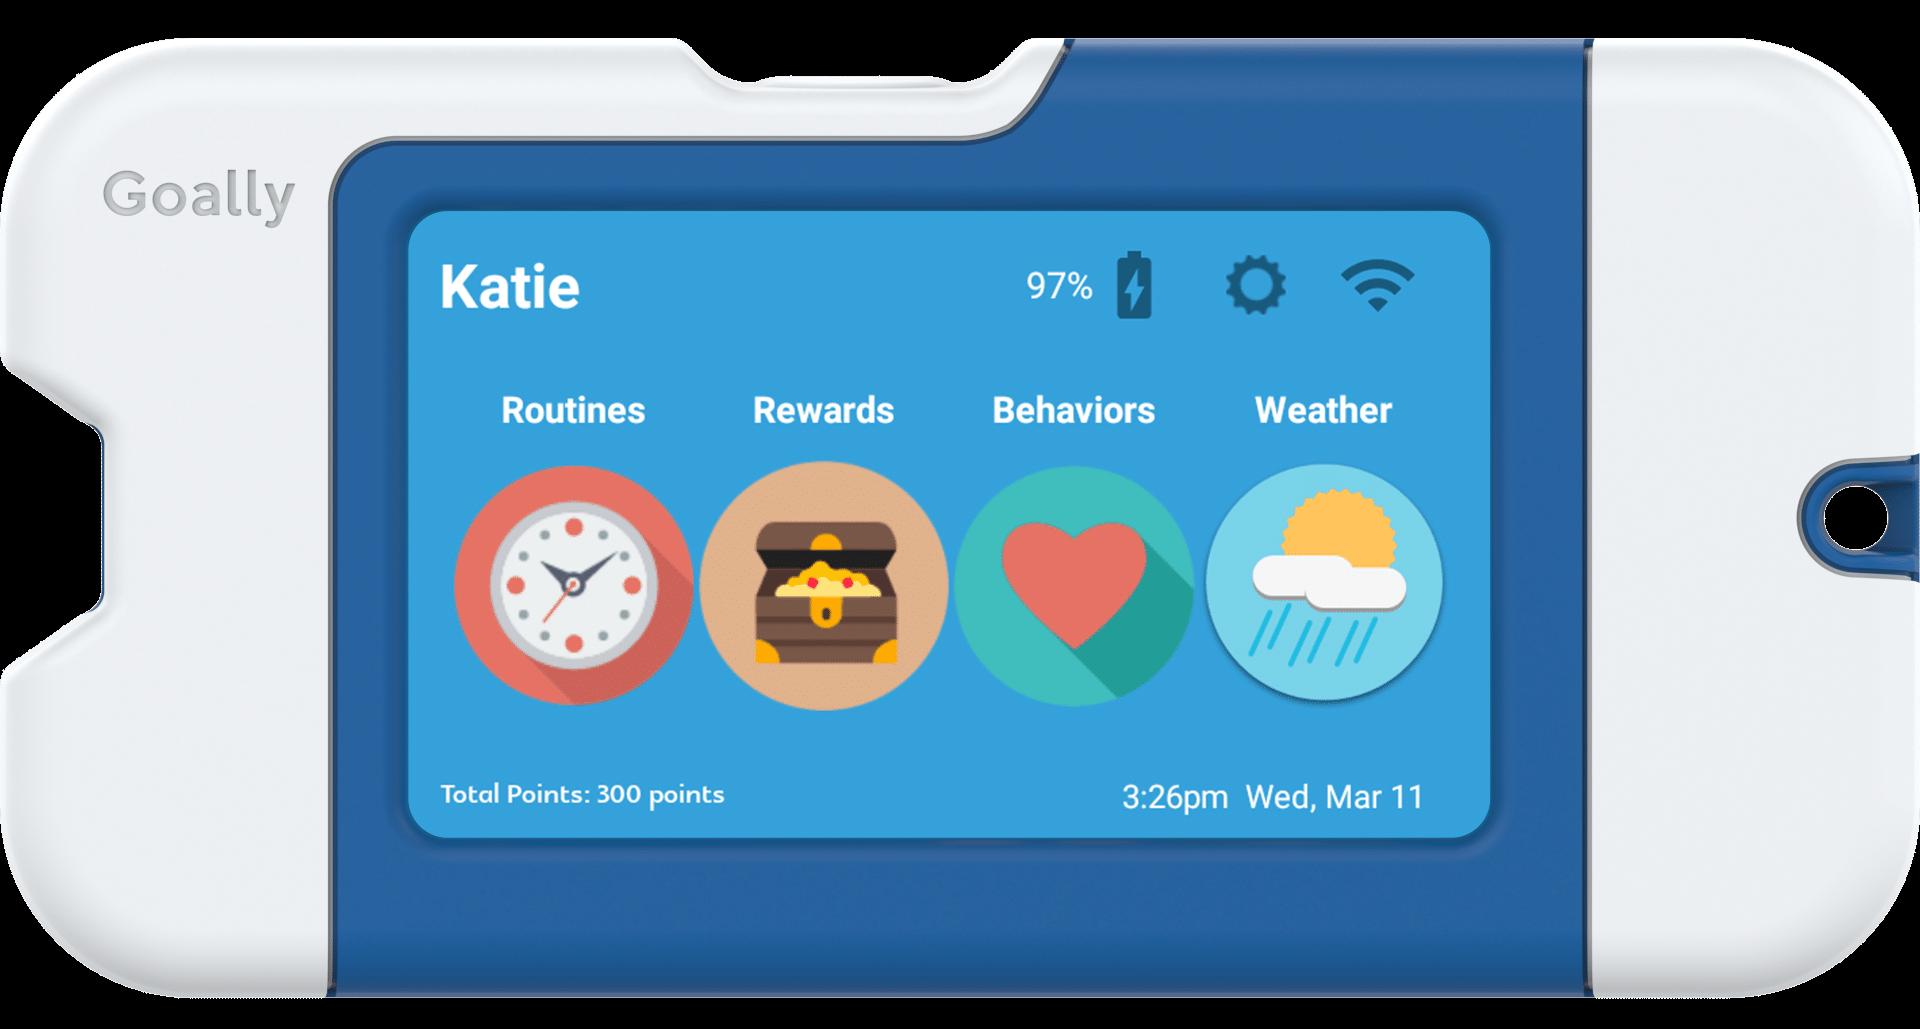 goally app graphic